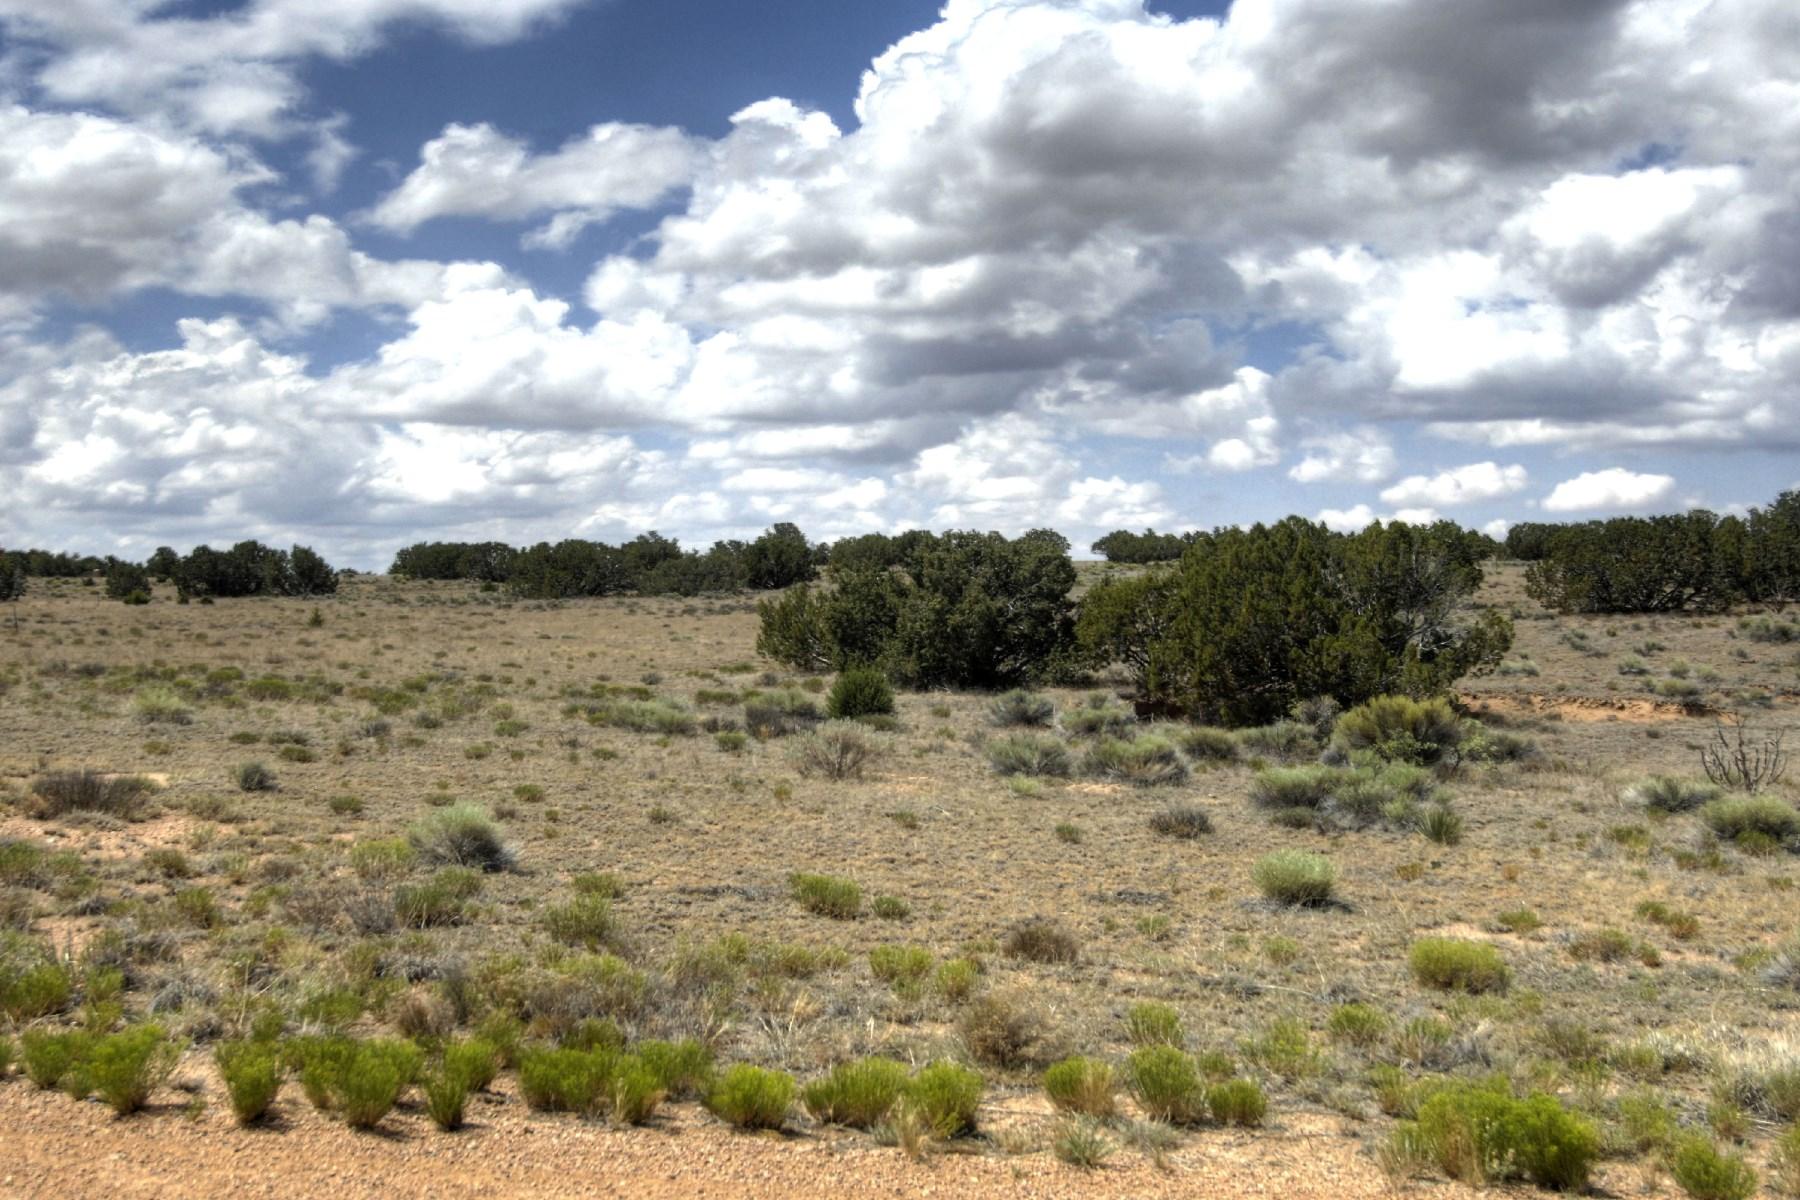 Land for Sale at 133 Paseo Aragon, Lot #58 Las Campanas & Los Santeros, Santa Fe, New Mexico 87506 United States